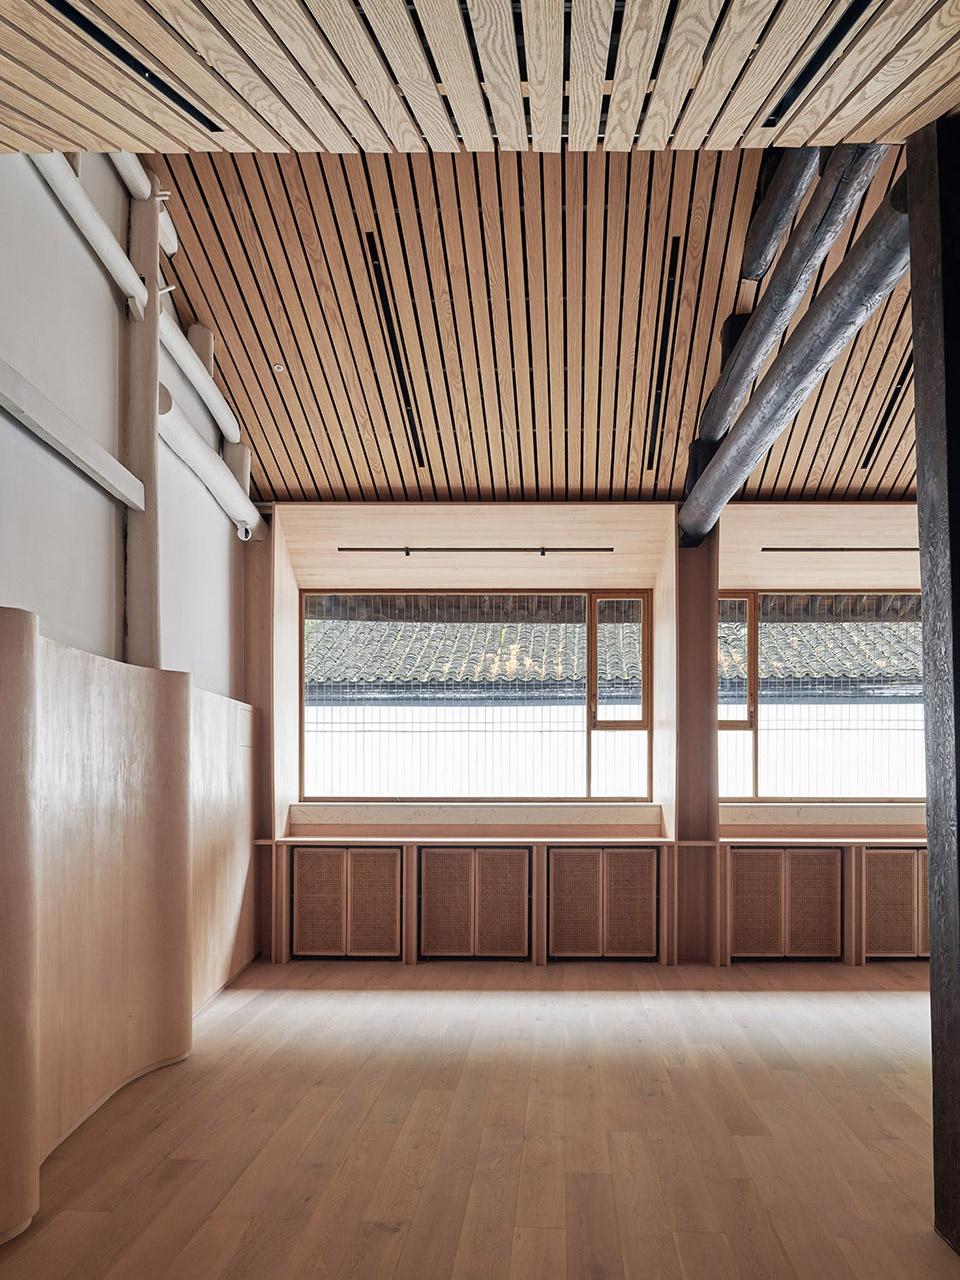 36-Random-Art-Space-Hnagzhou-by-AIR-Architects-1-960x1280.jpg